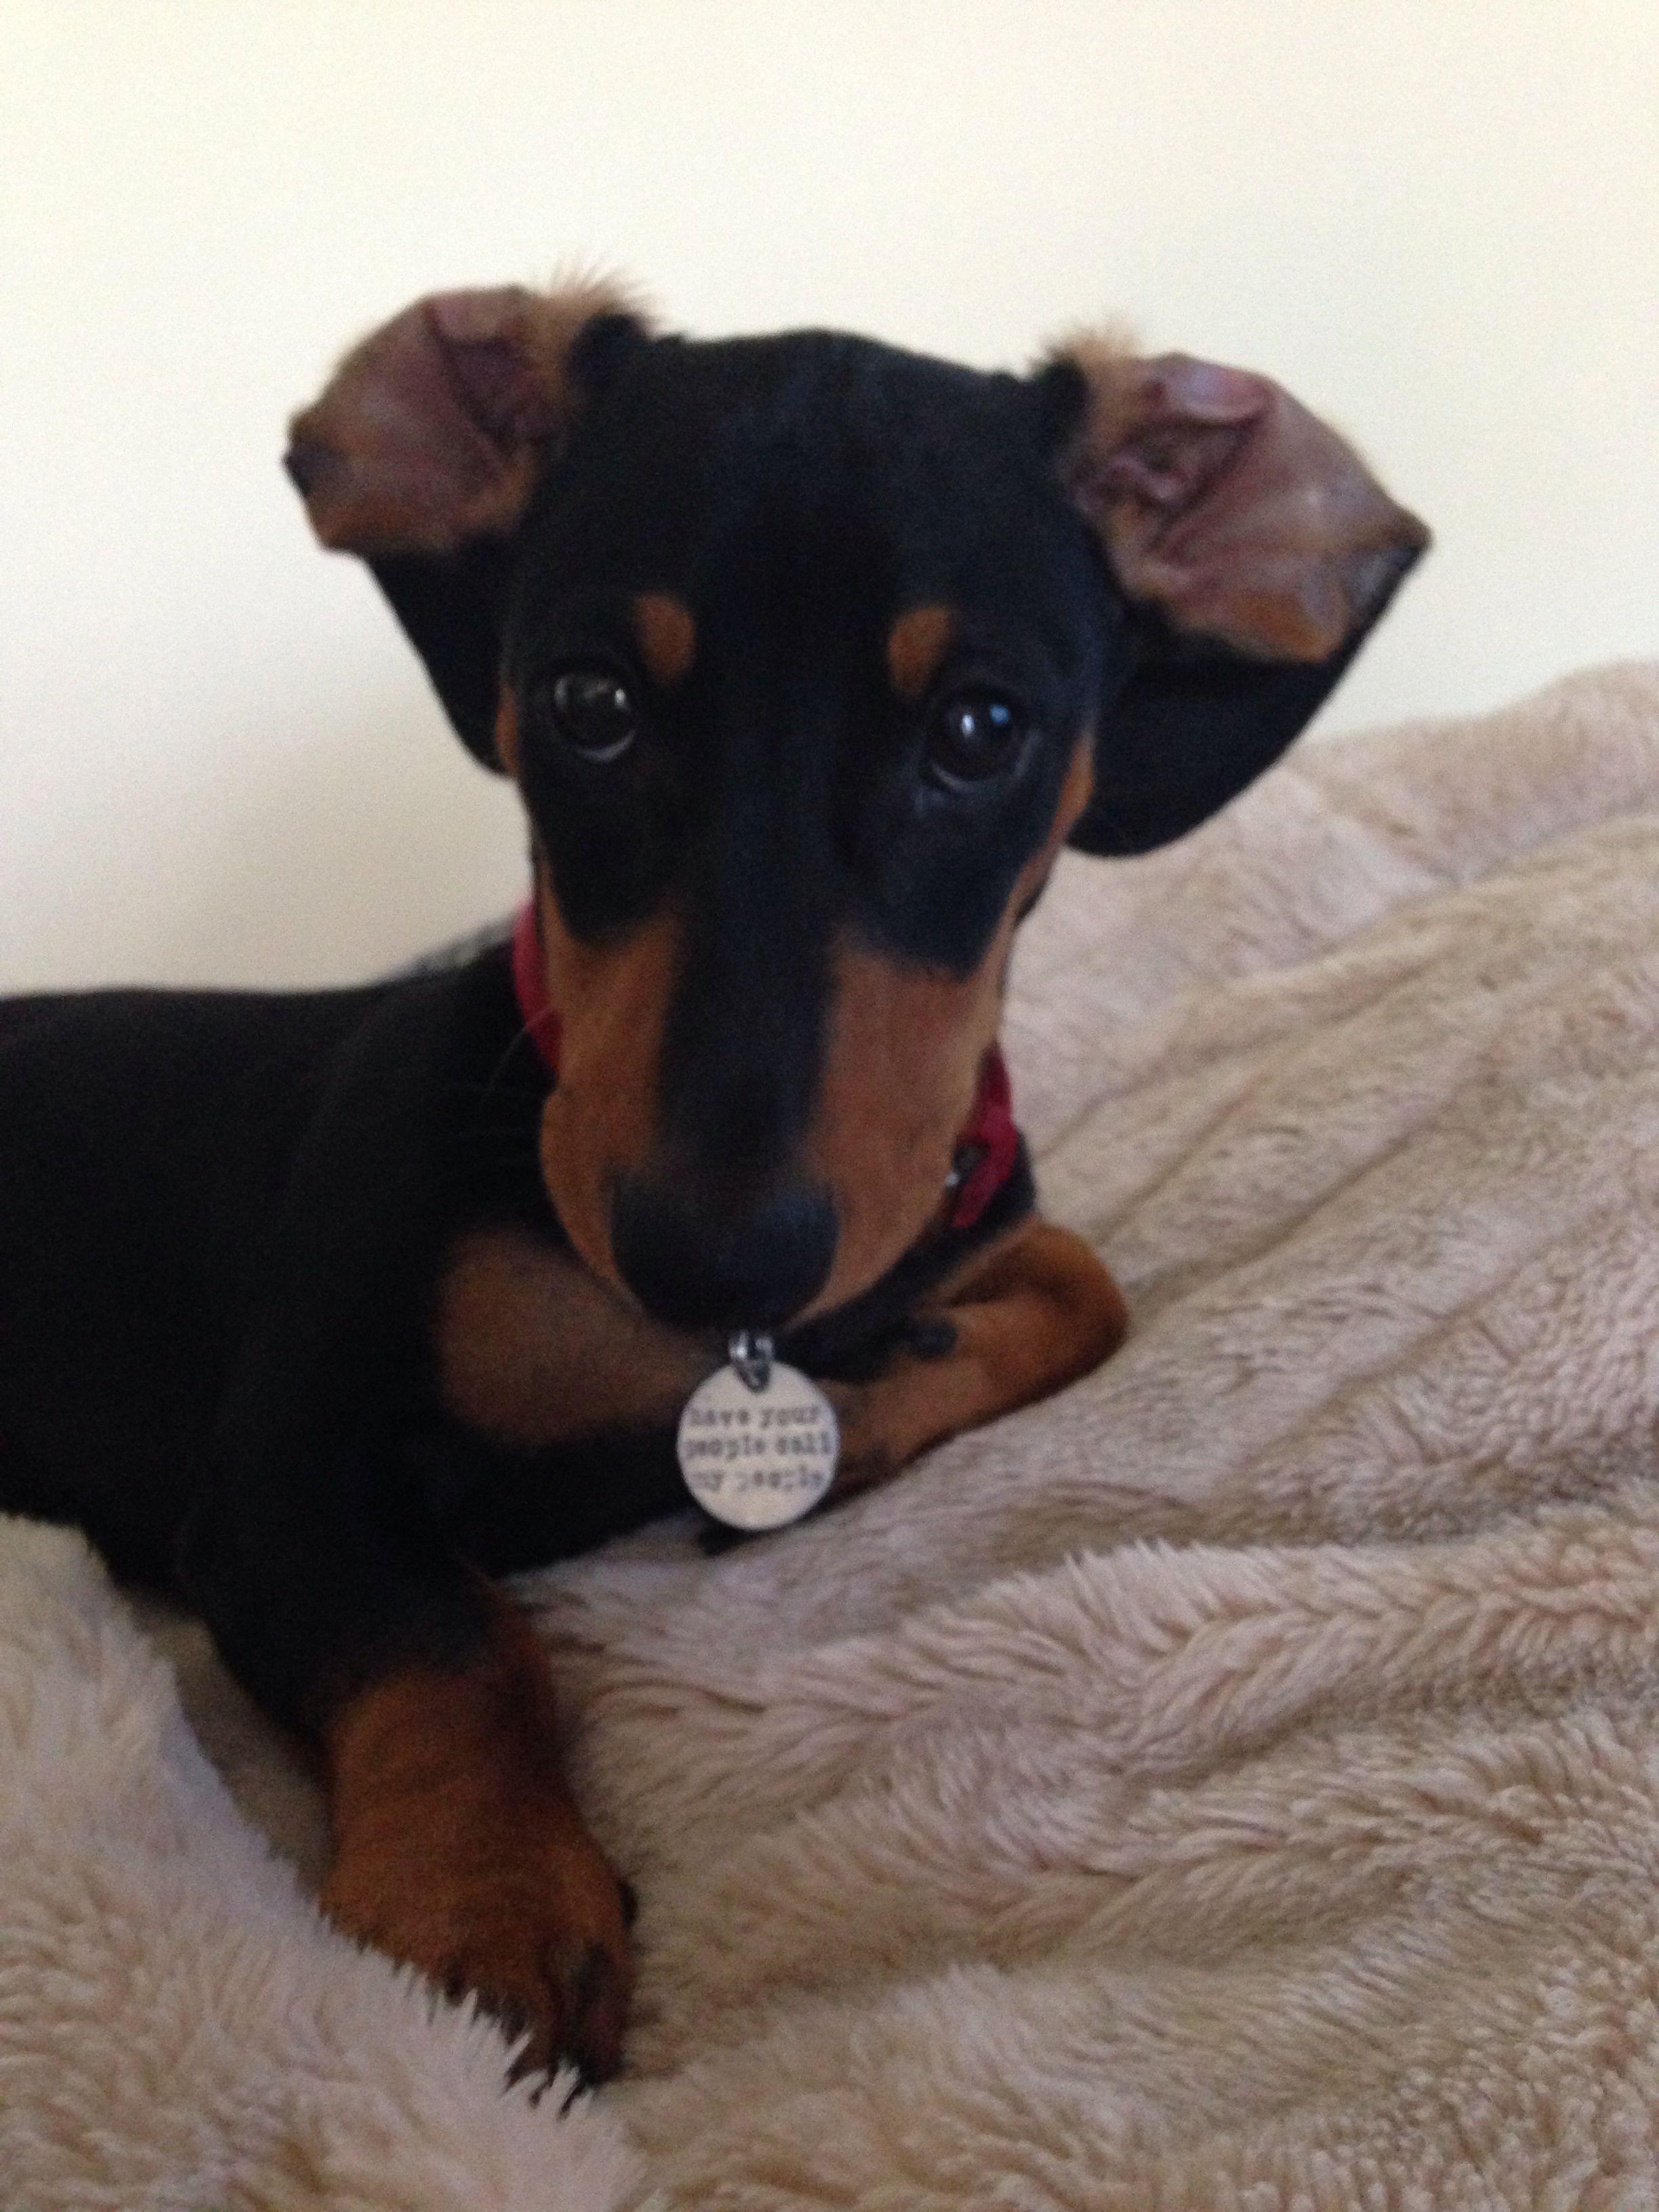 Bed Ears Dachshund Dog Baby Dachshund Dachshund Love